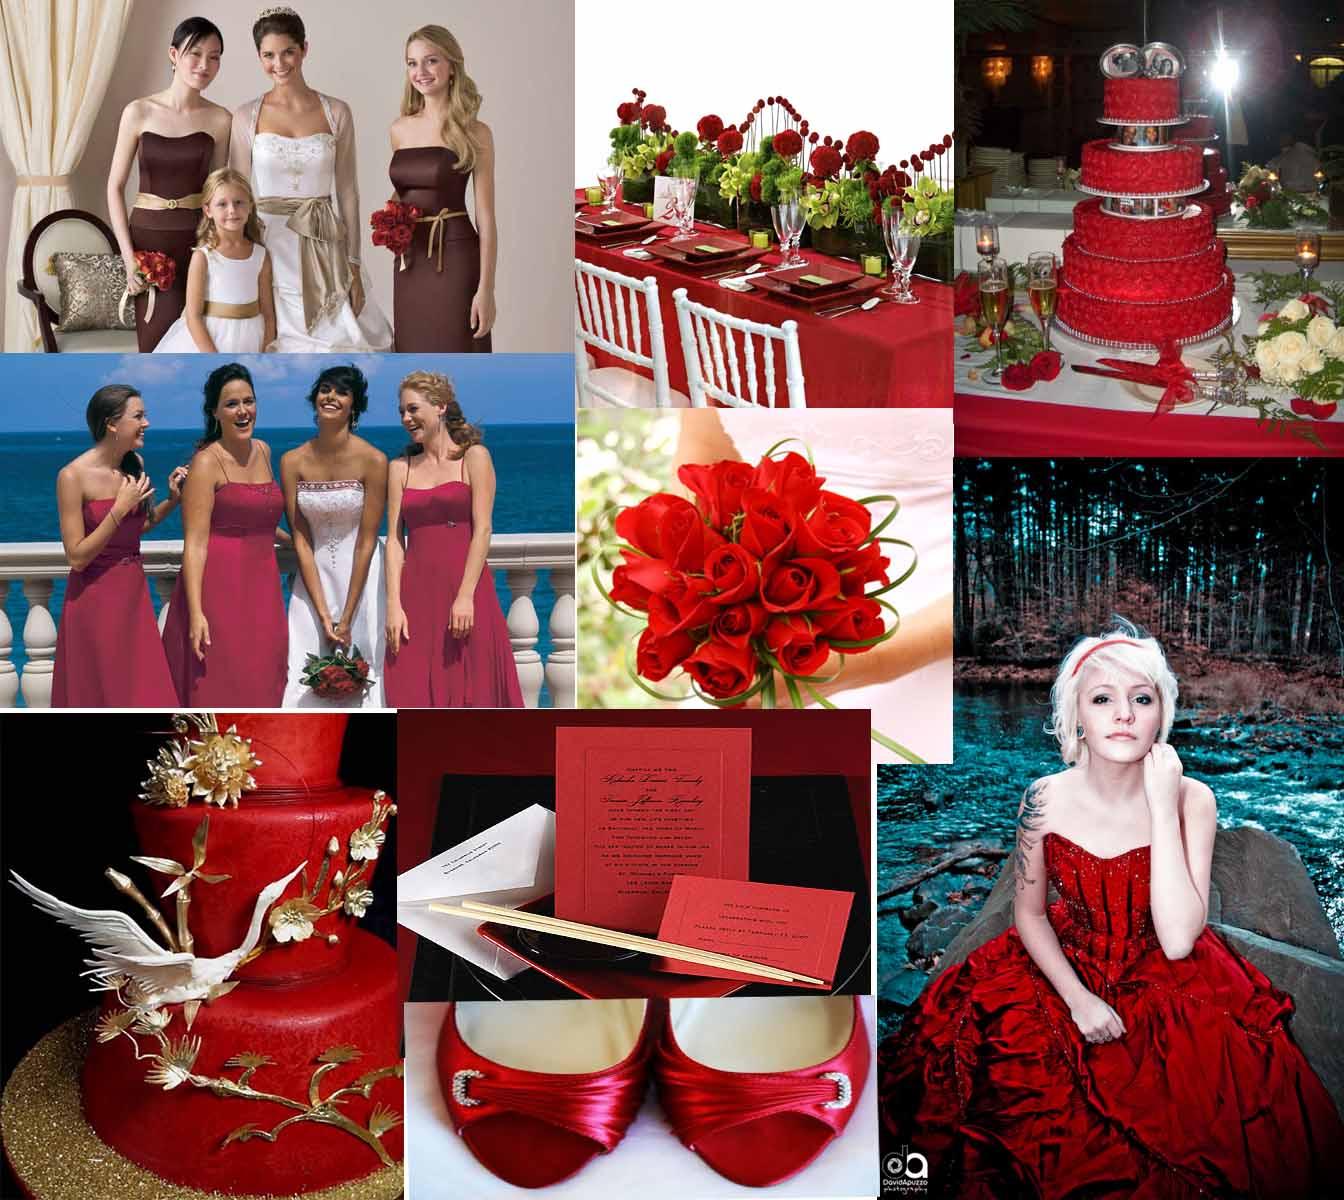 ideas table Red red runner  Wedding: ideas Alternative wedding